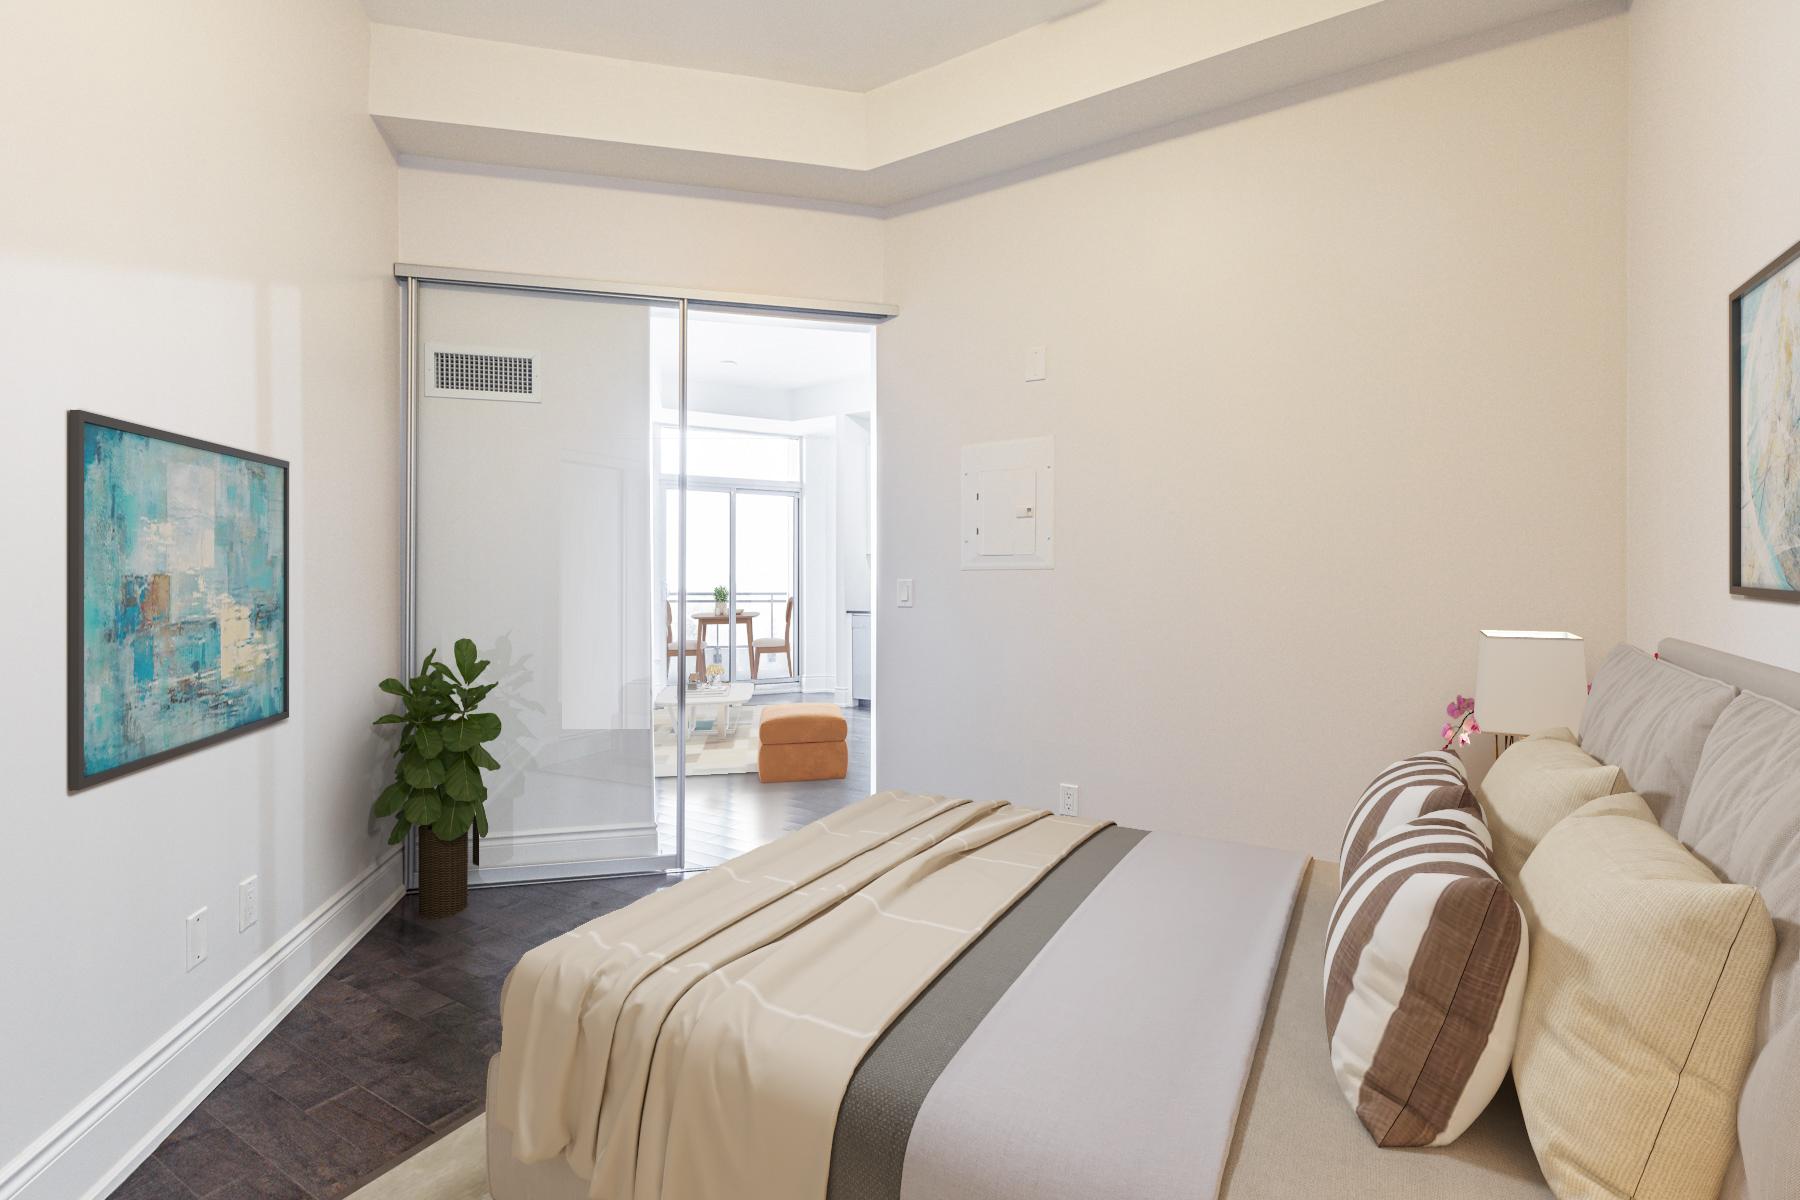 23 Glebe Rd W Unit 918 master bedroom with sliding glass doors.